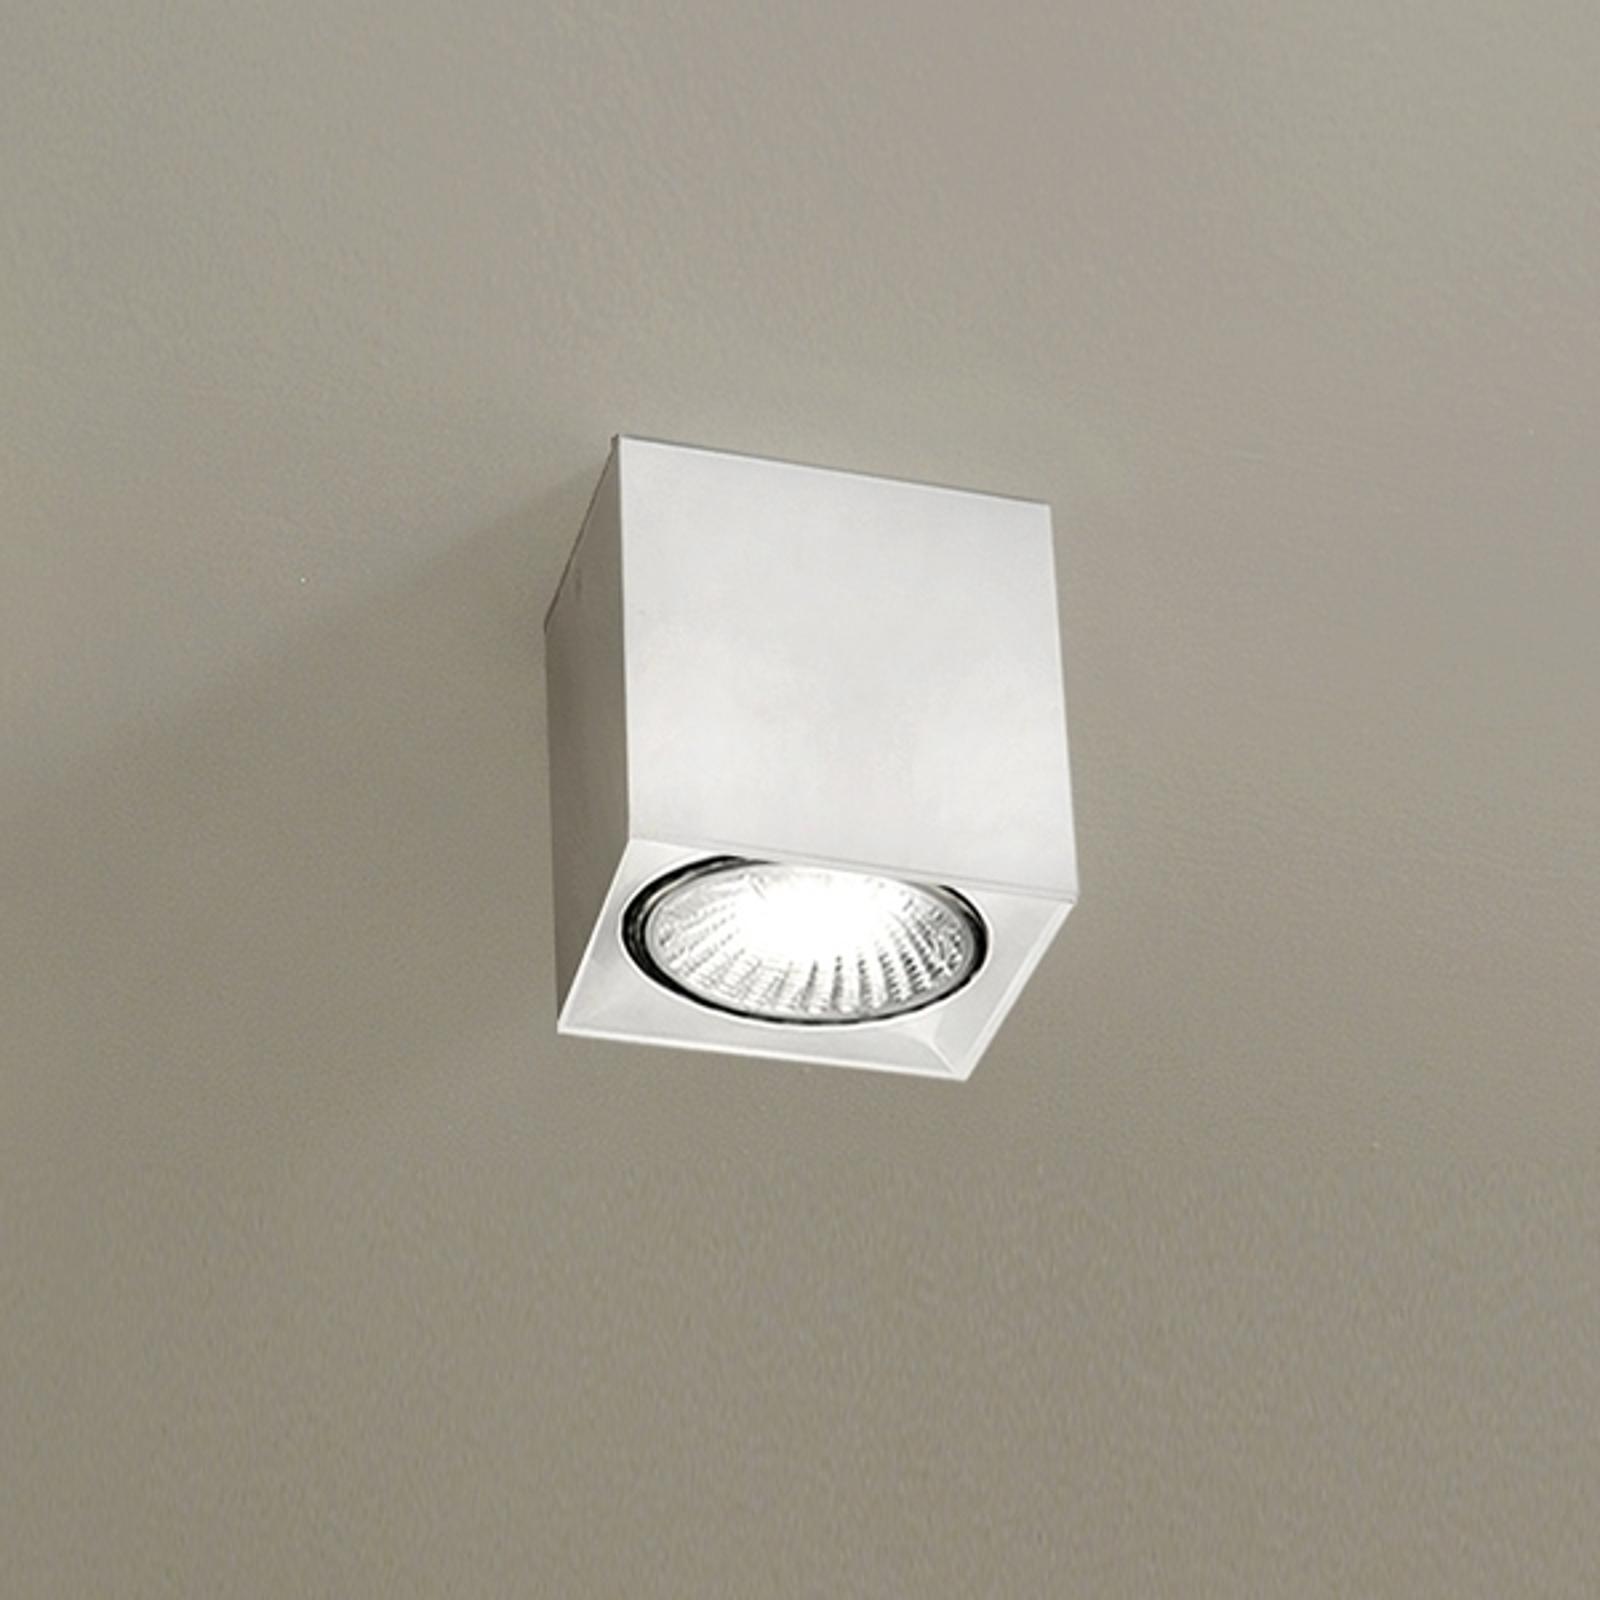 Plafondlamp Dau Spot in kubusvorm, wit